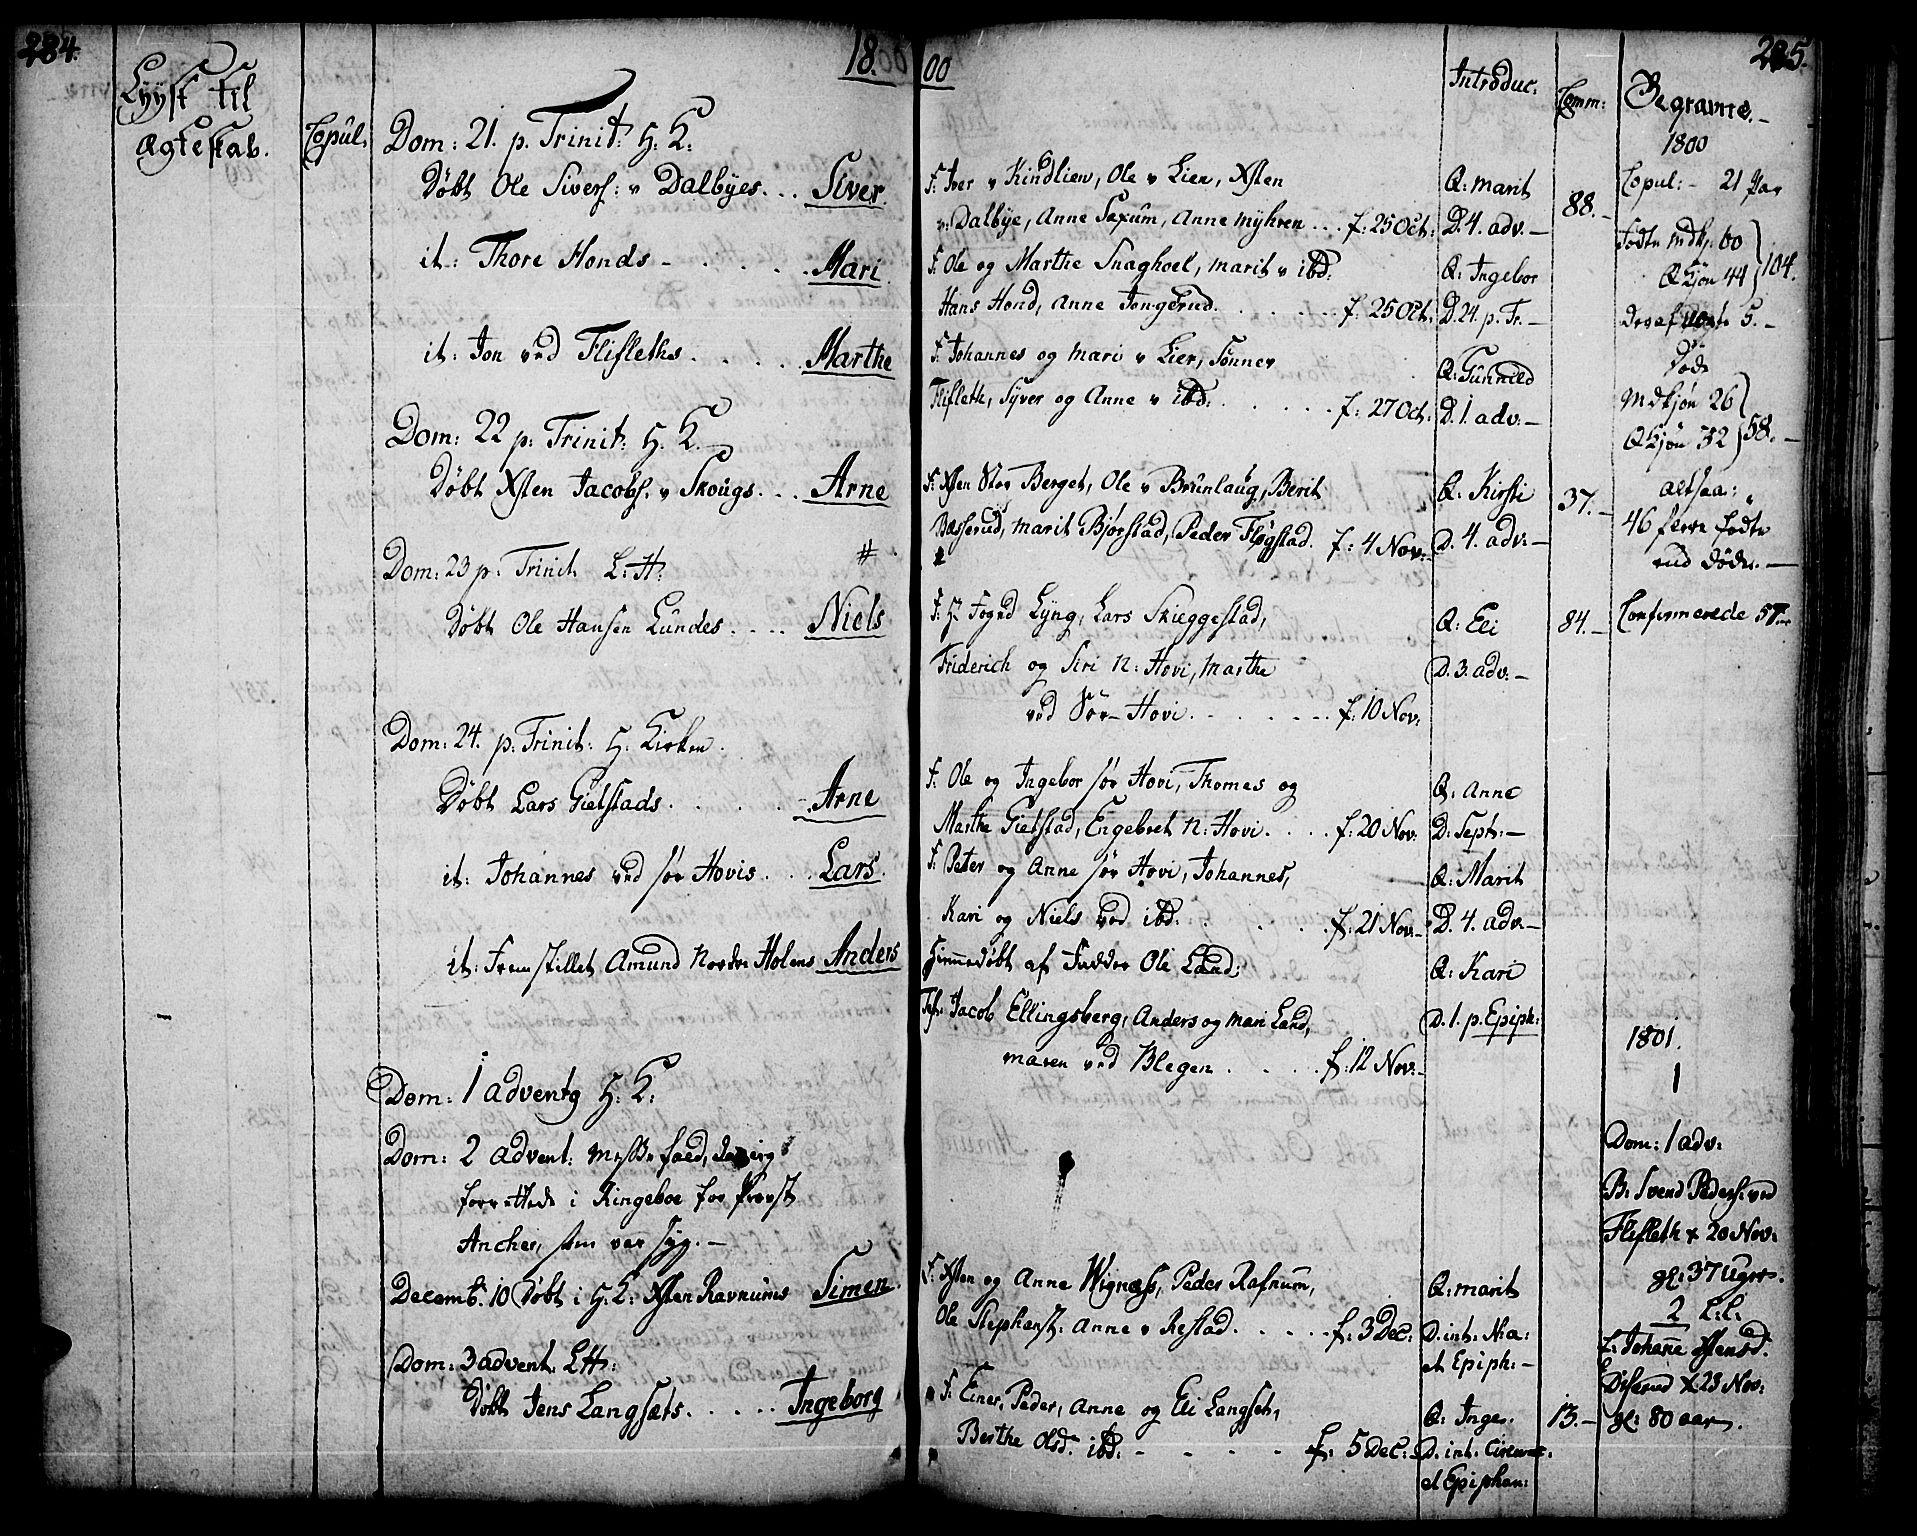 SAH, Fåberg prestekontor, Ministerialbok nr. 2, 1775-1818, s. 284-285